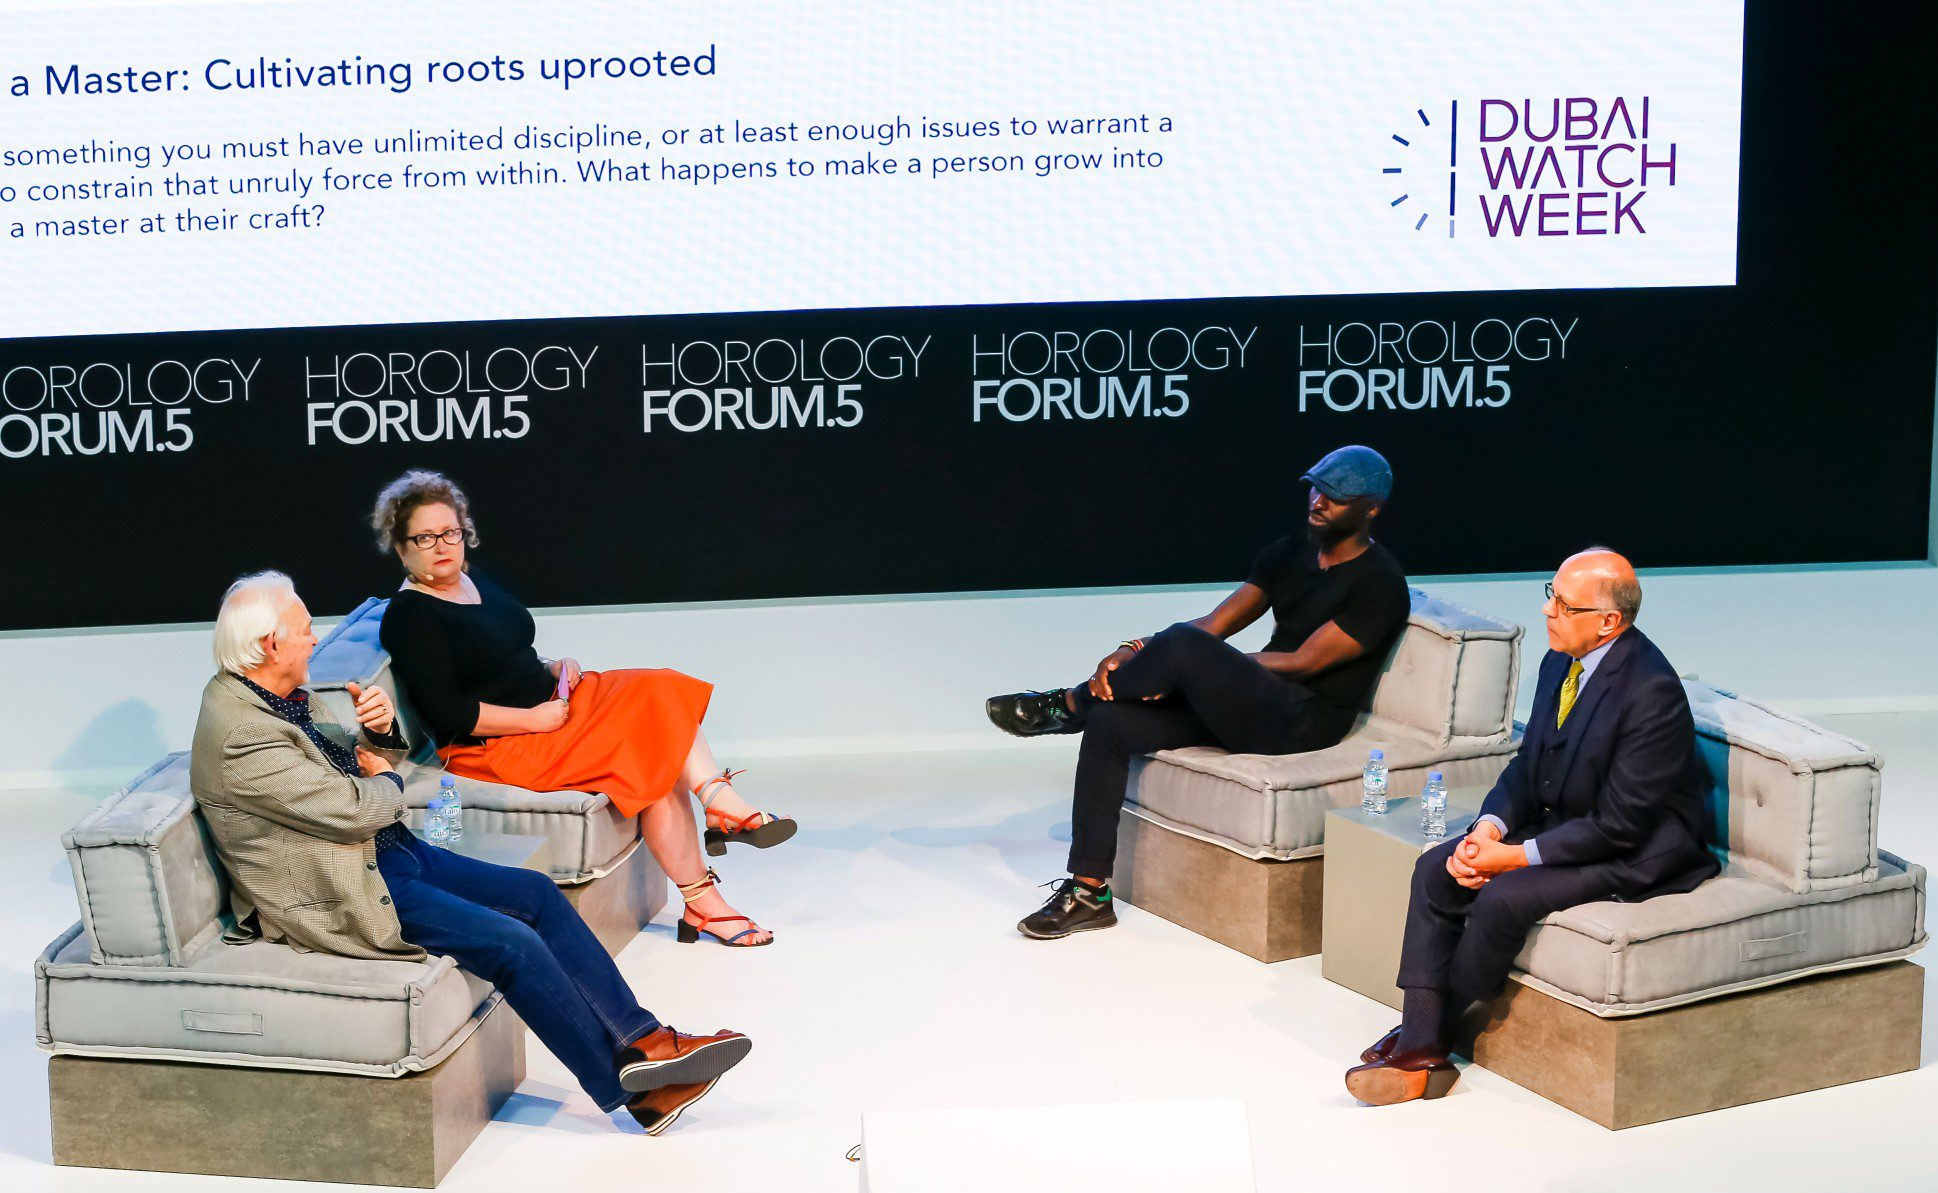 Dubai Watch Week 2021